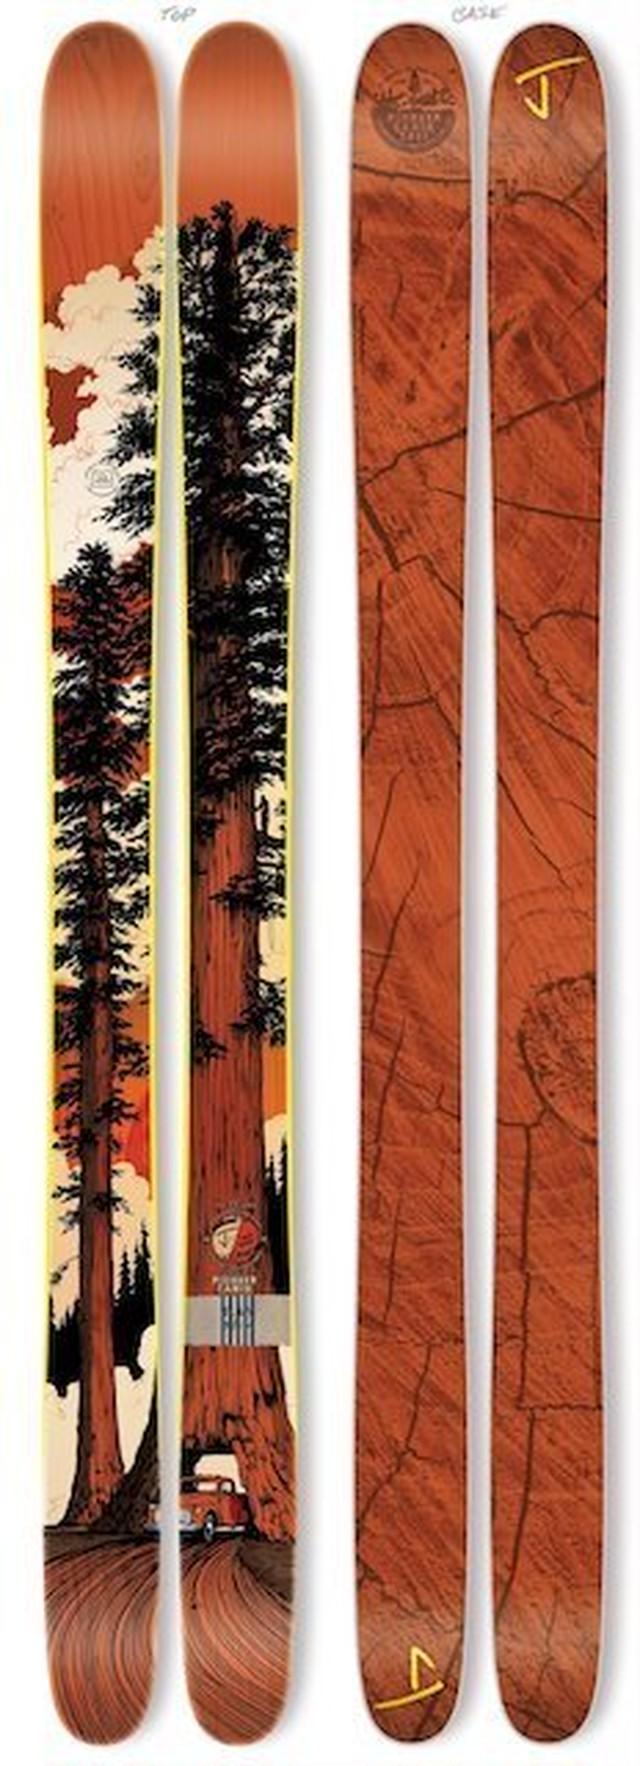 J skis - フレンド「パイオニアキャビン」アダム・ヘインズ x Jコラボ限定版スキー 【メーカー完売】